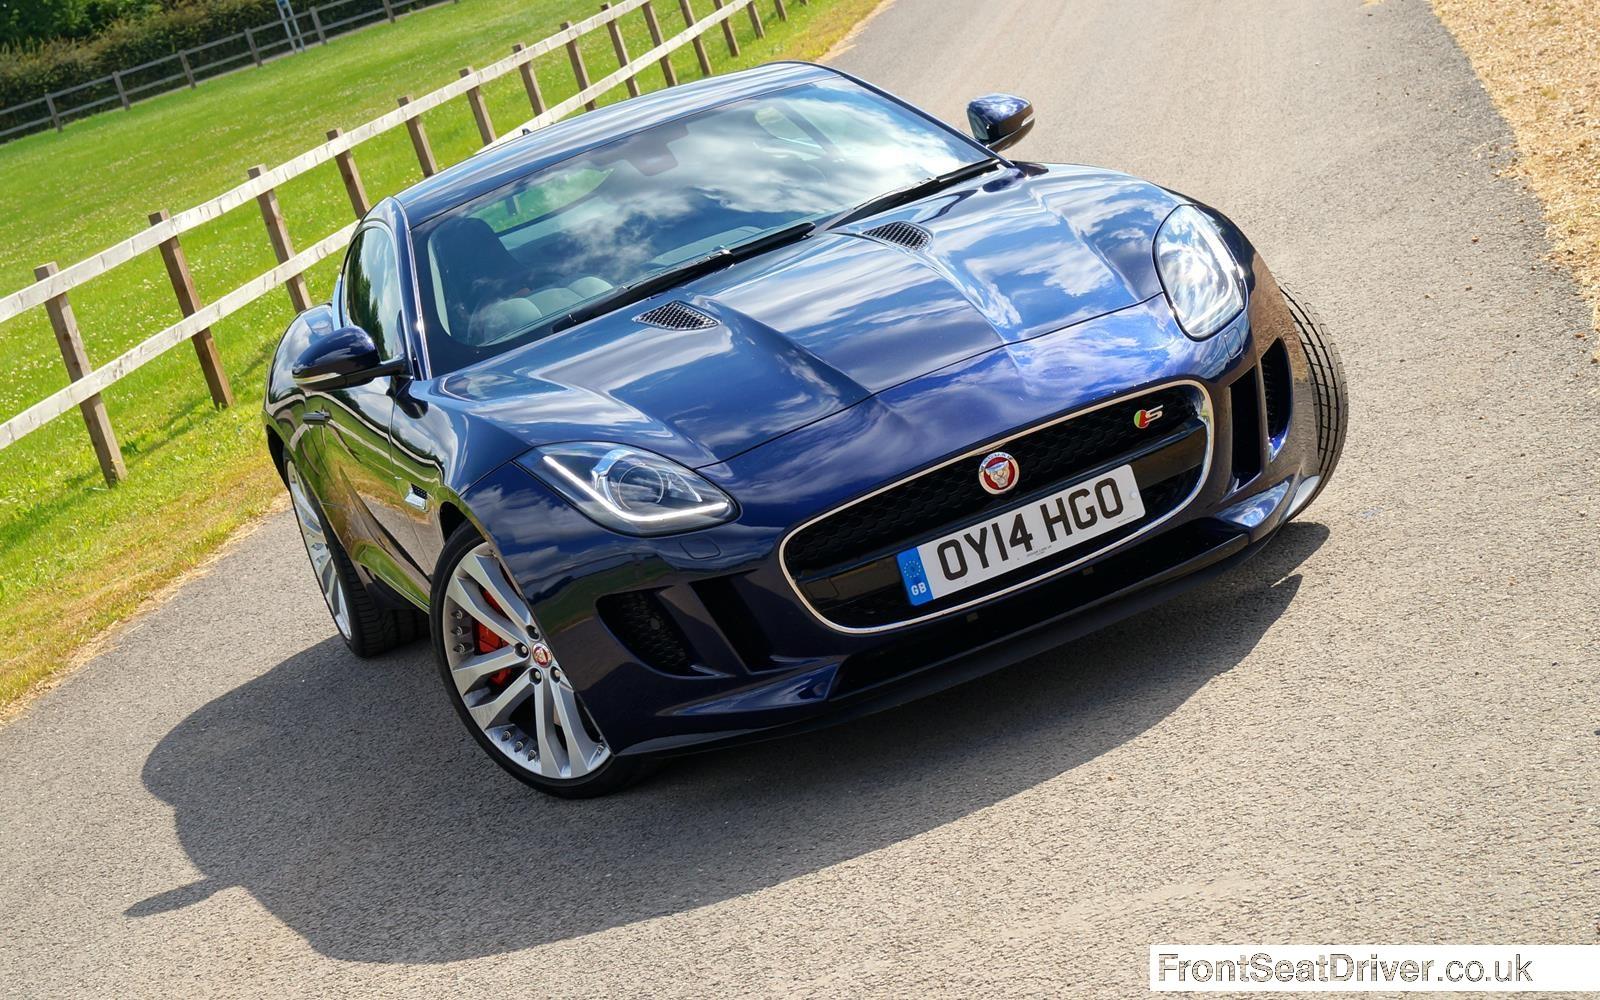 Jaguar F-Type V6 S Coupe2014 High Front Phil Huff FrontSeatDriver.co.uk